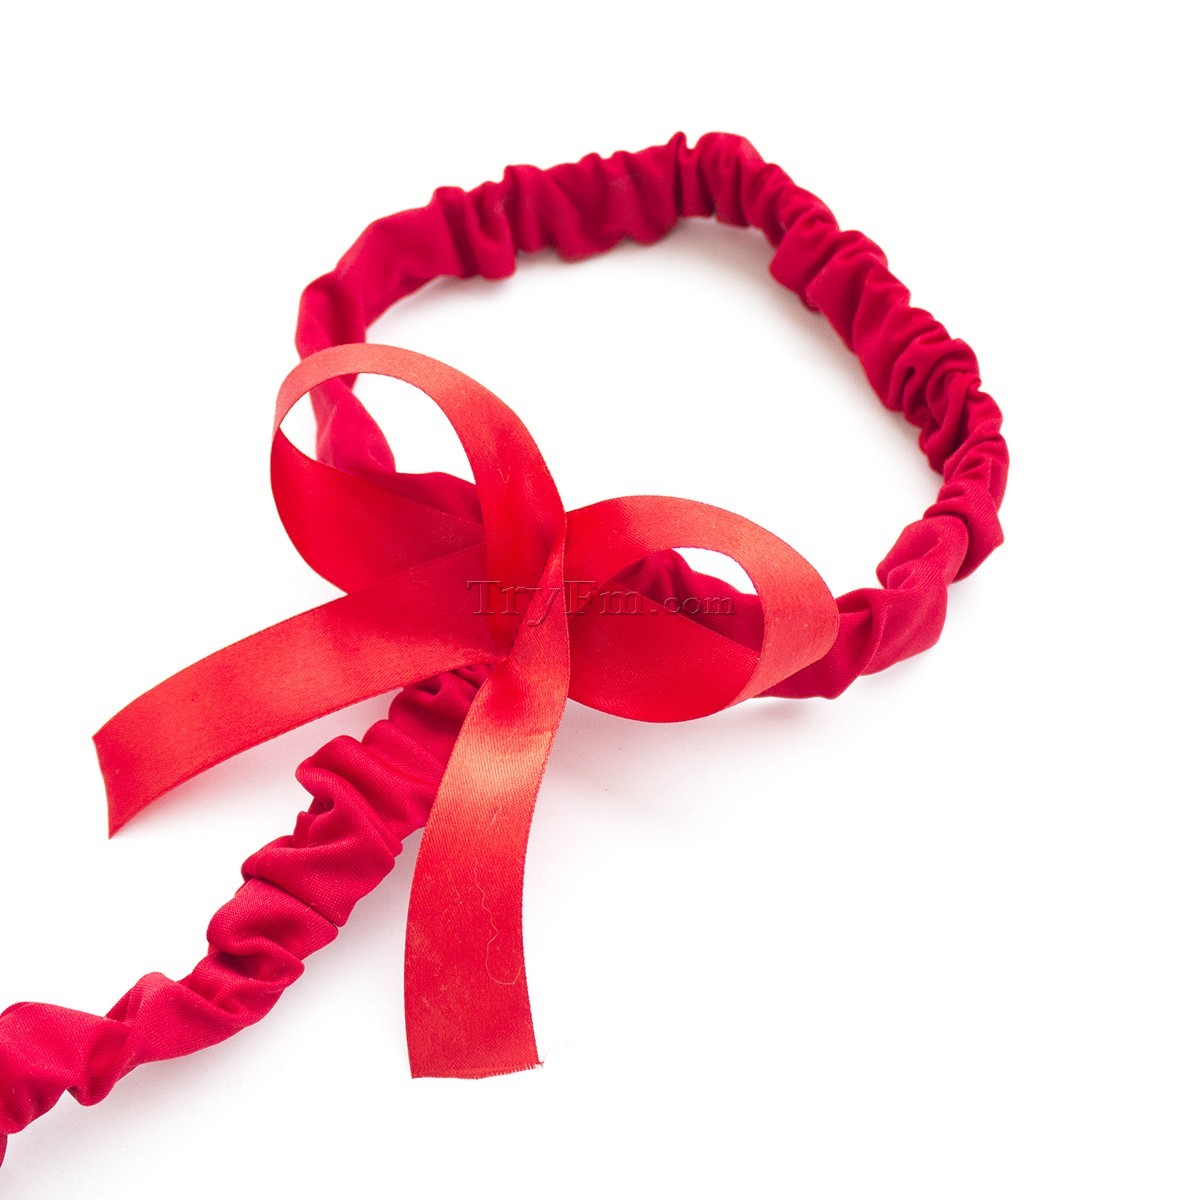 7-Temptation-Red-Rope-10.jpg